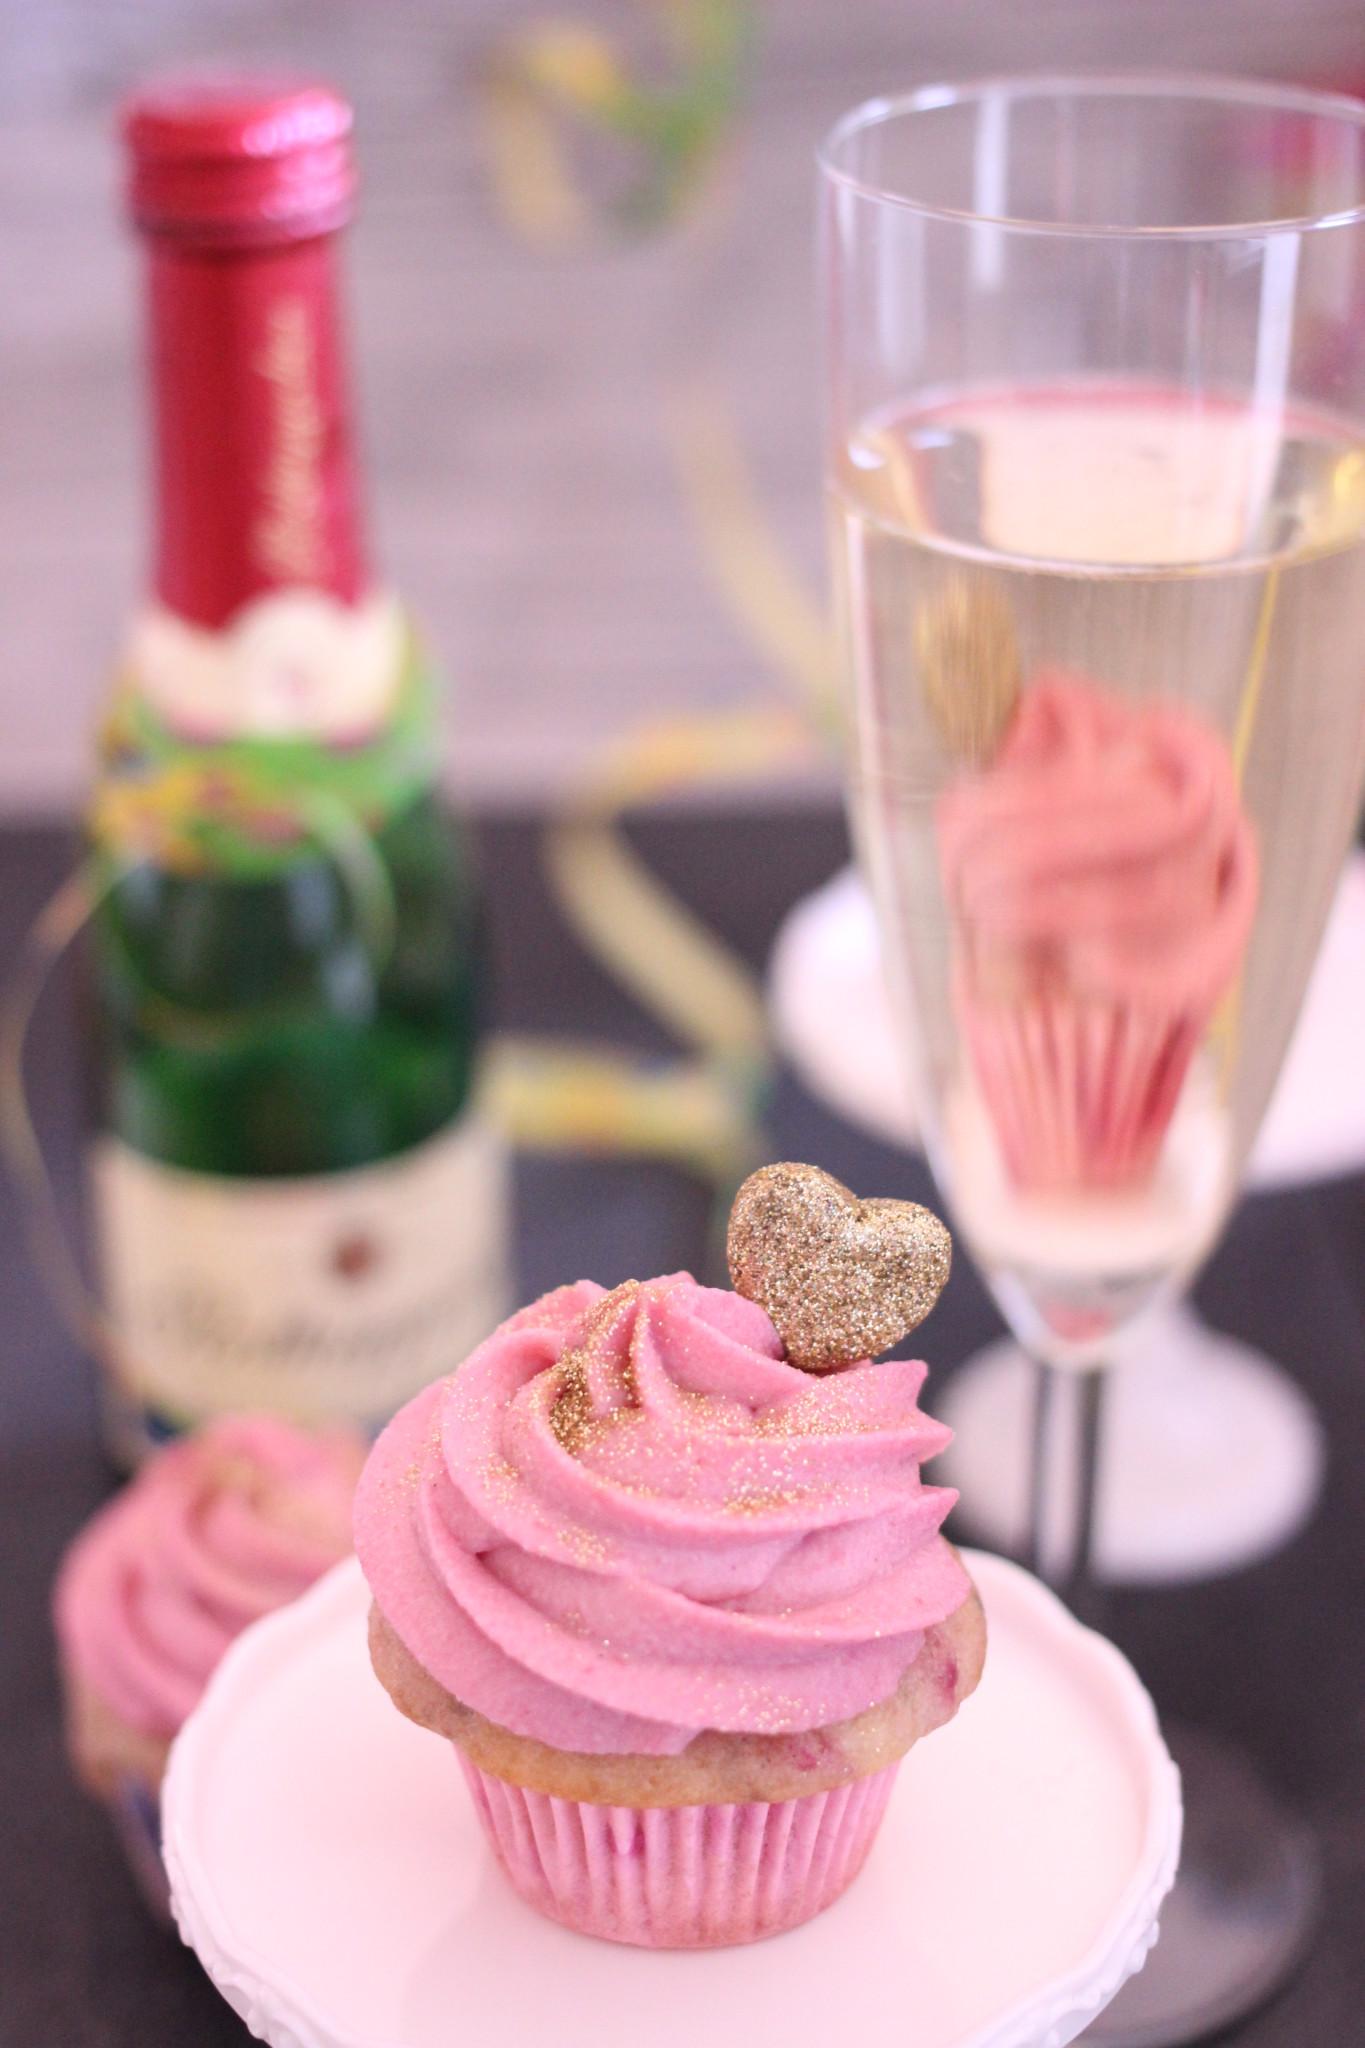 Himbeere Champagne Cupcakes Ein Prickelnder Geburtstag Sarahs Cakes